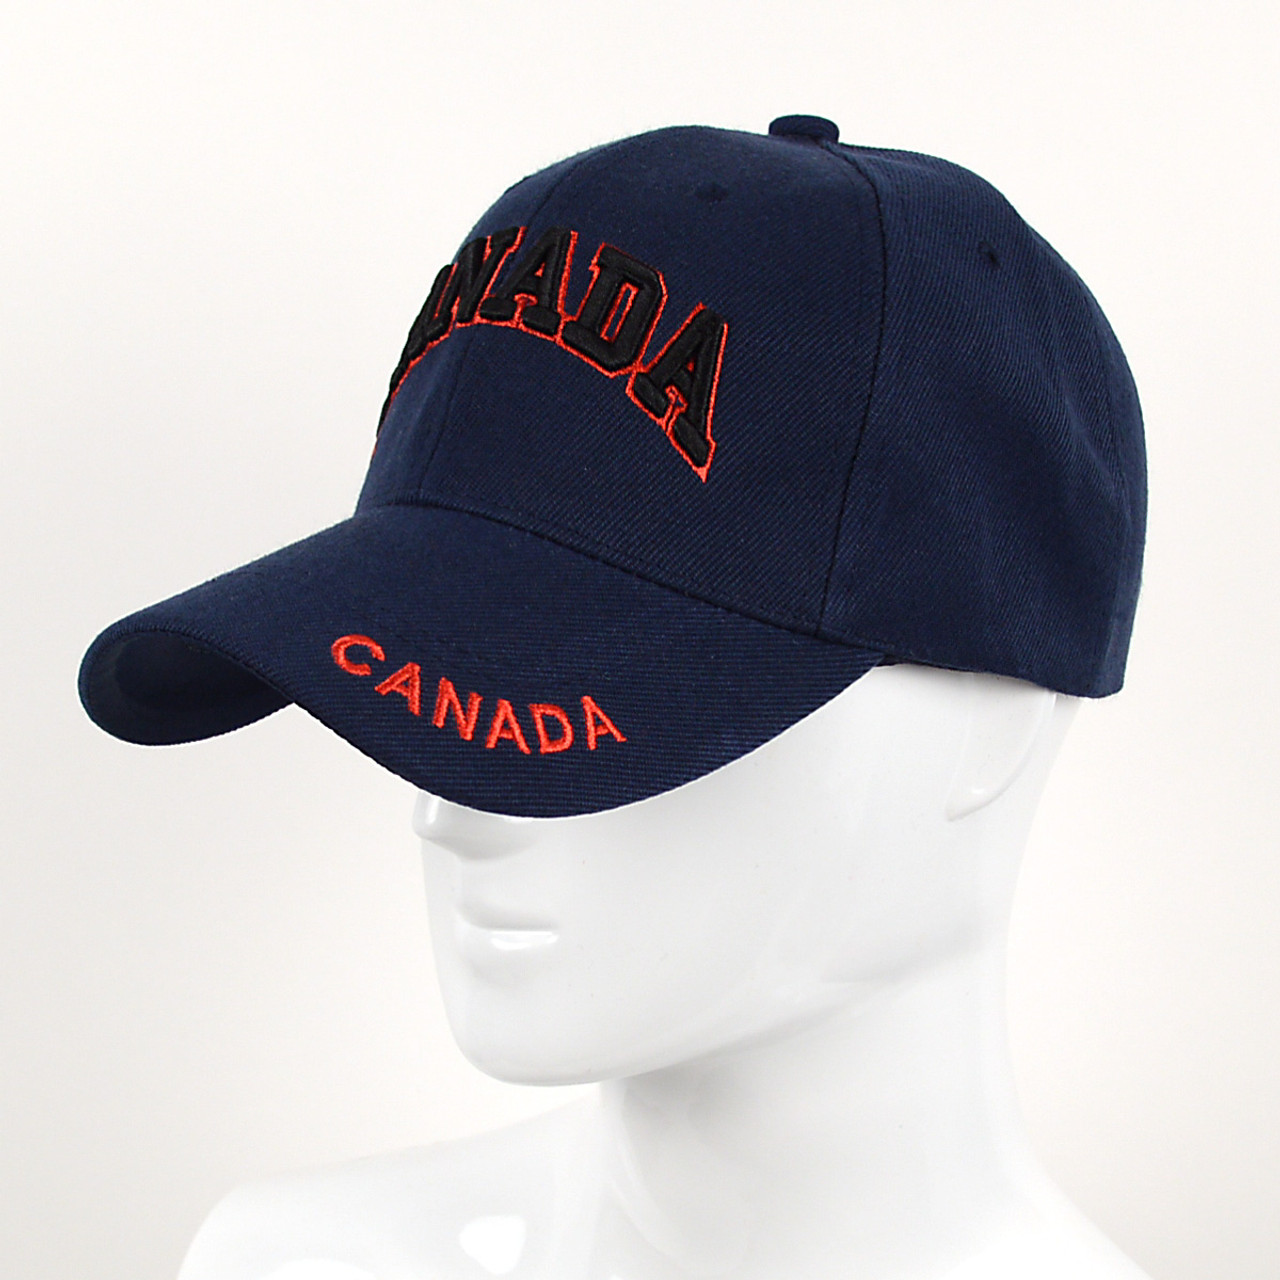 9fef370e9e3b1 Canada Navy 3D Embroidered Baseball Cap